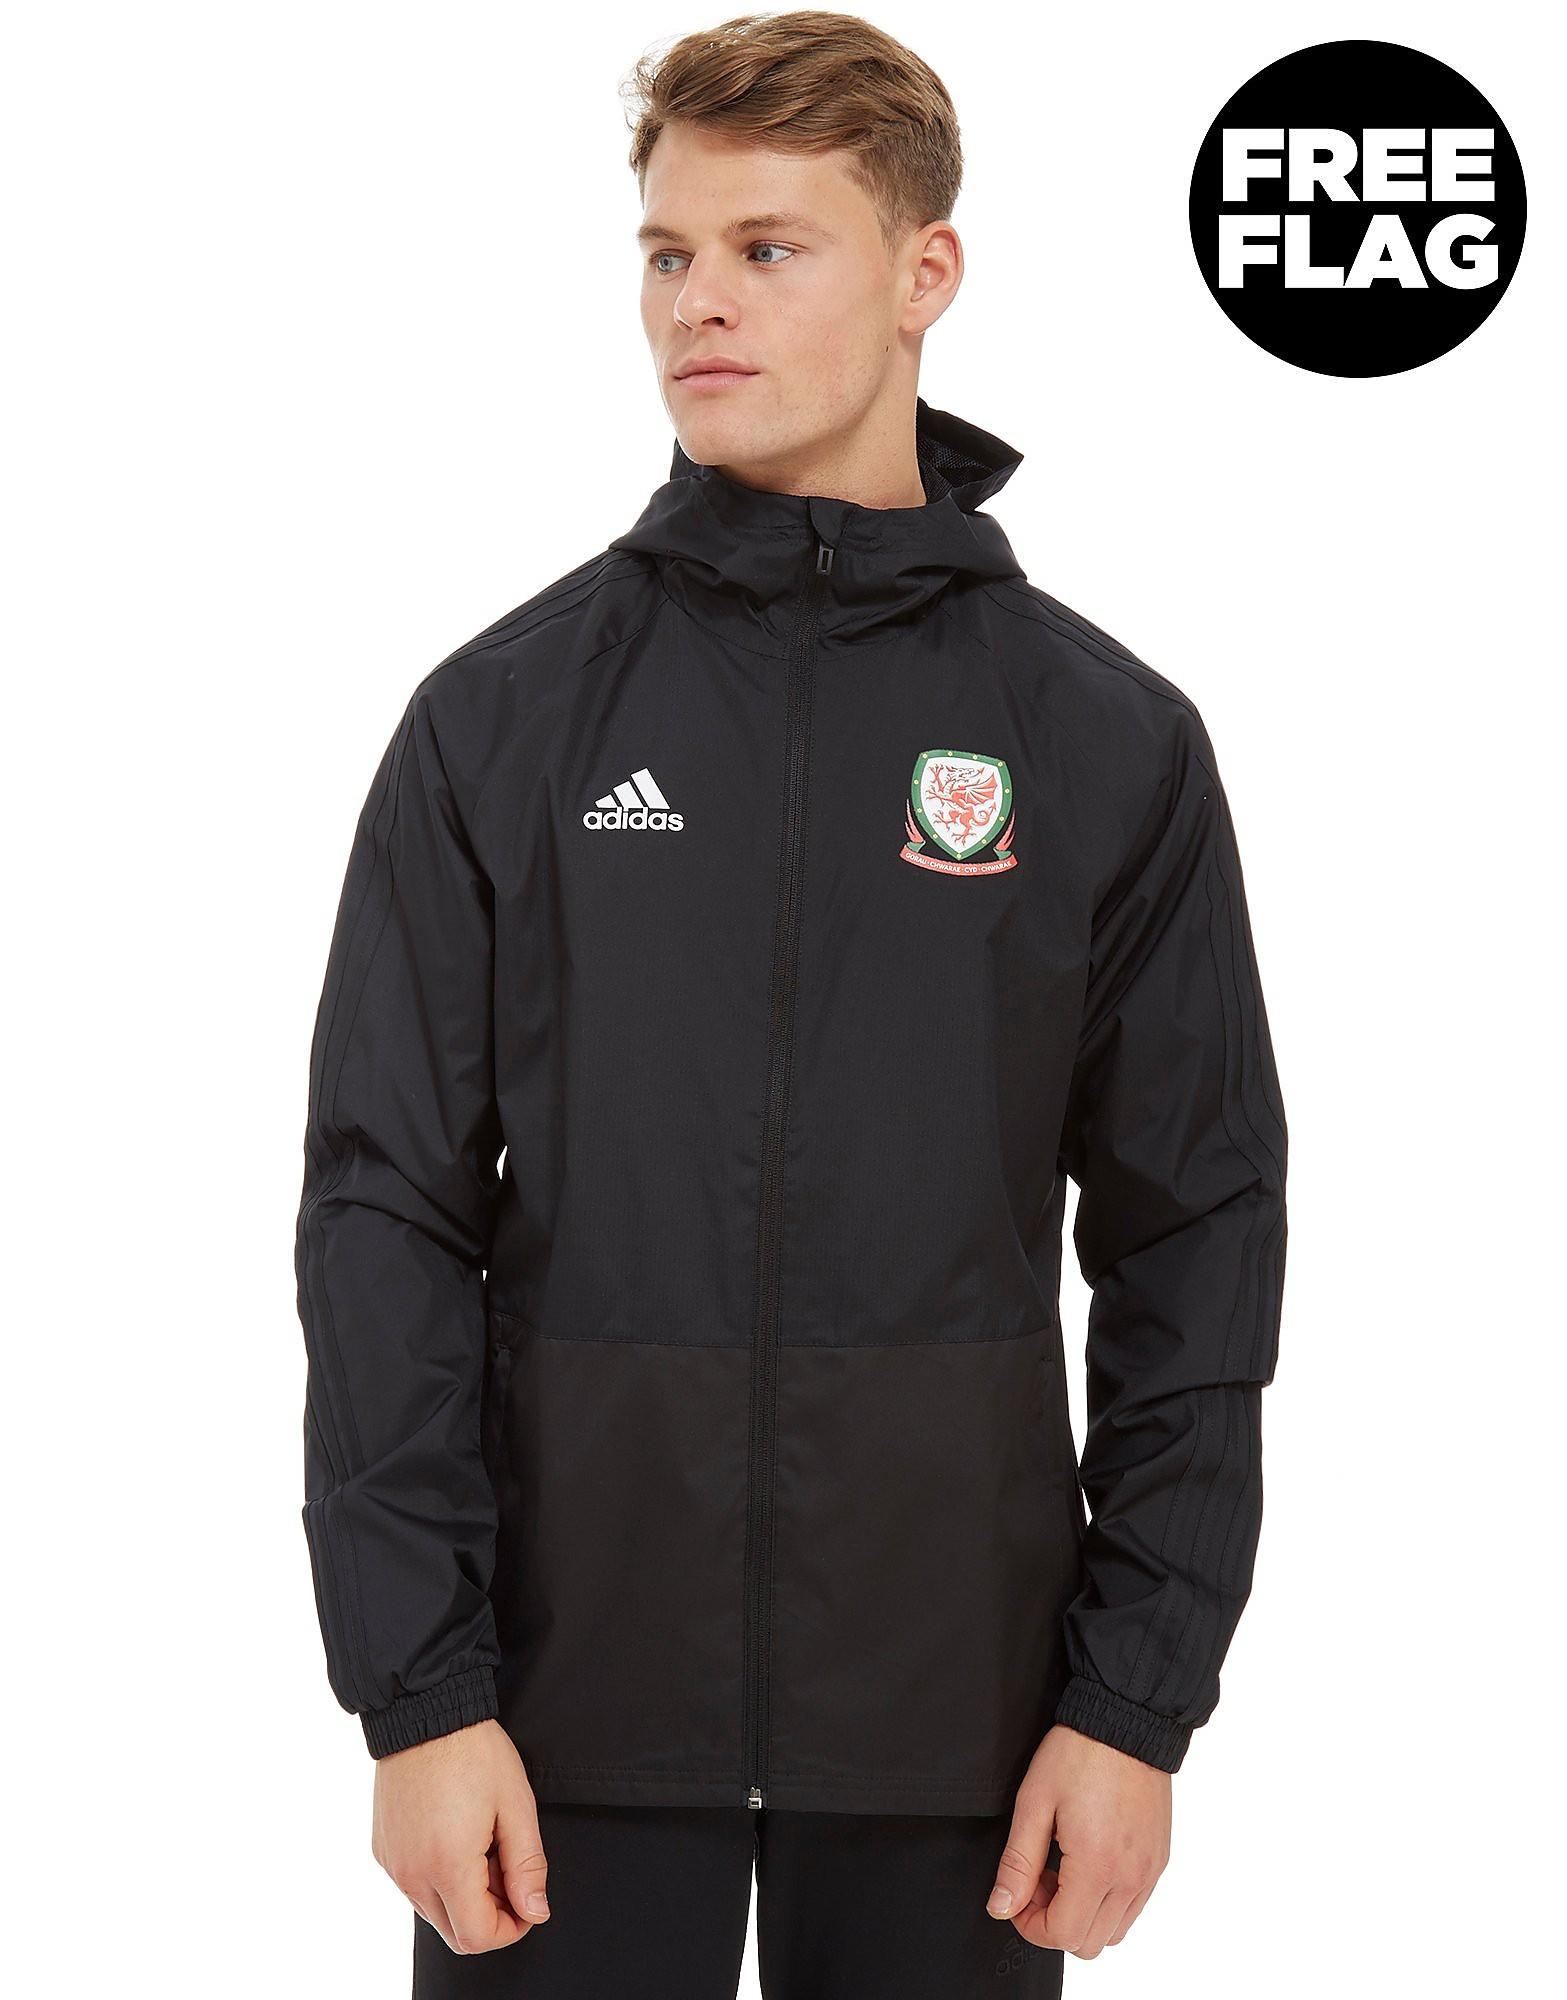 adidas FA Wales 2018 Rain Jacket